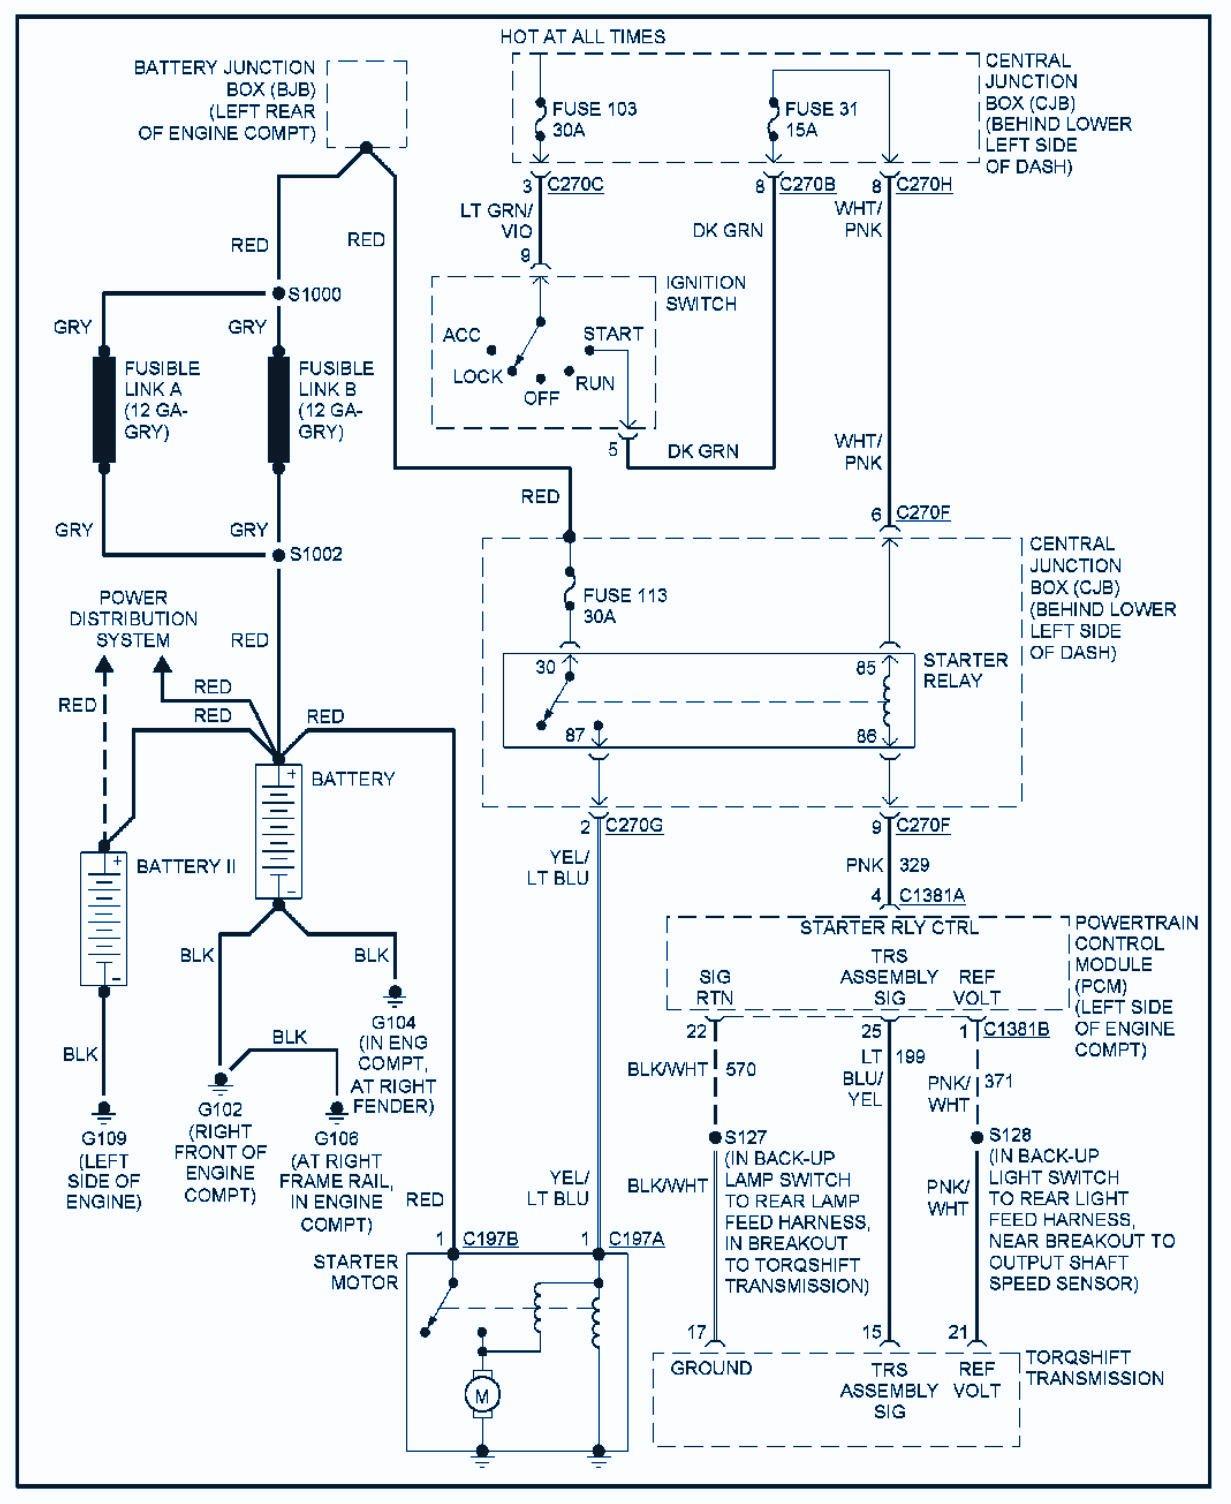 pcm wiring diagram 1989 ford bronco